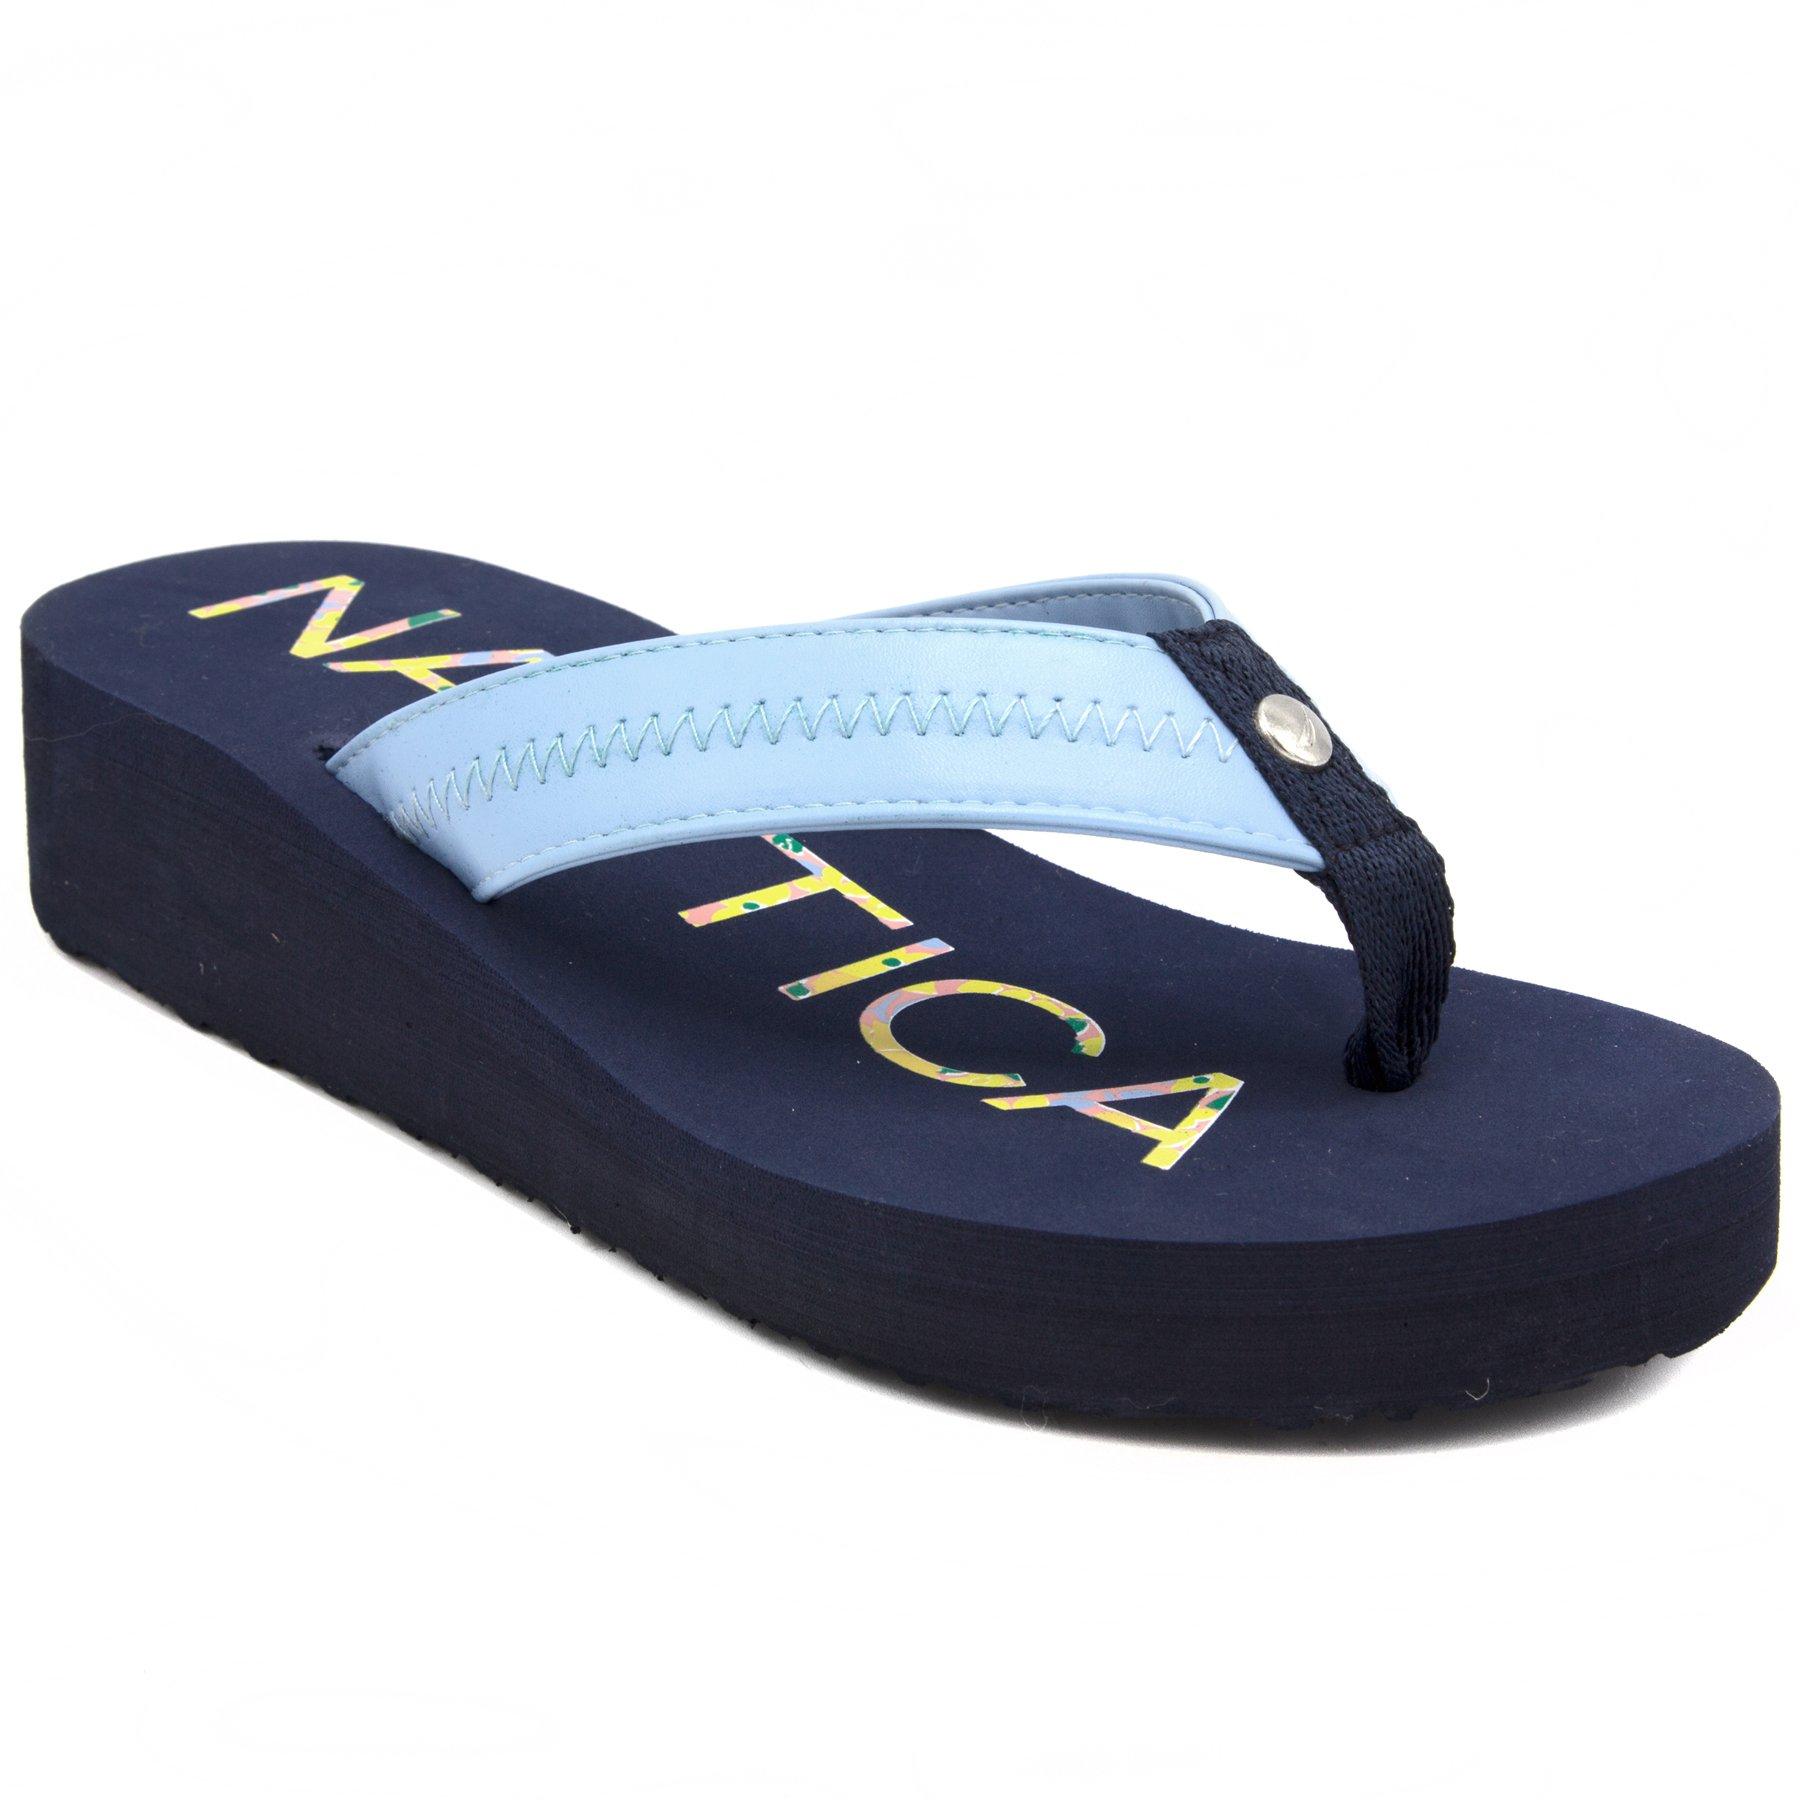 Nautica Women's Tedori Wedge Flip Flop, High Fashion Beach Sandal, Thong Style Slide Peacoat-8